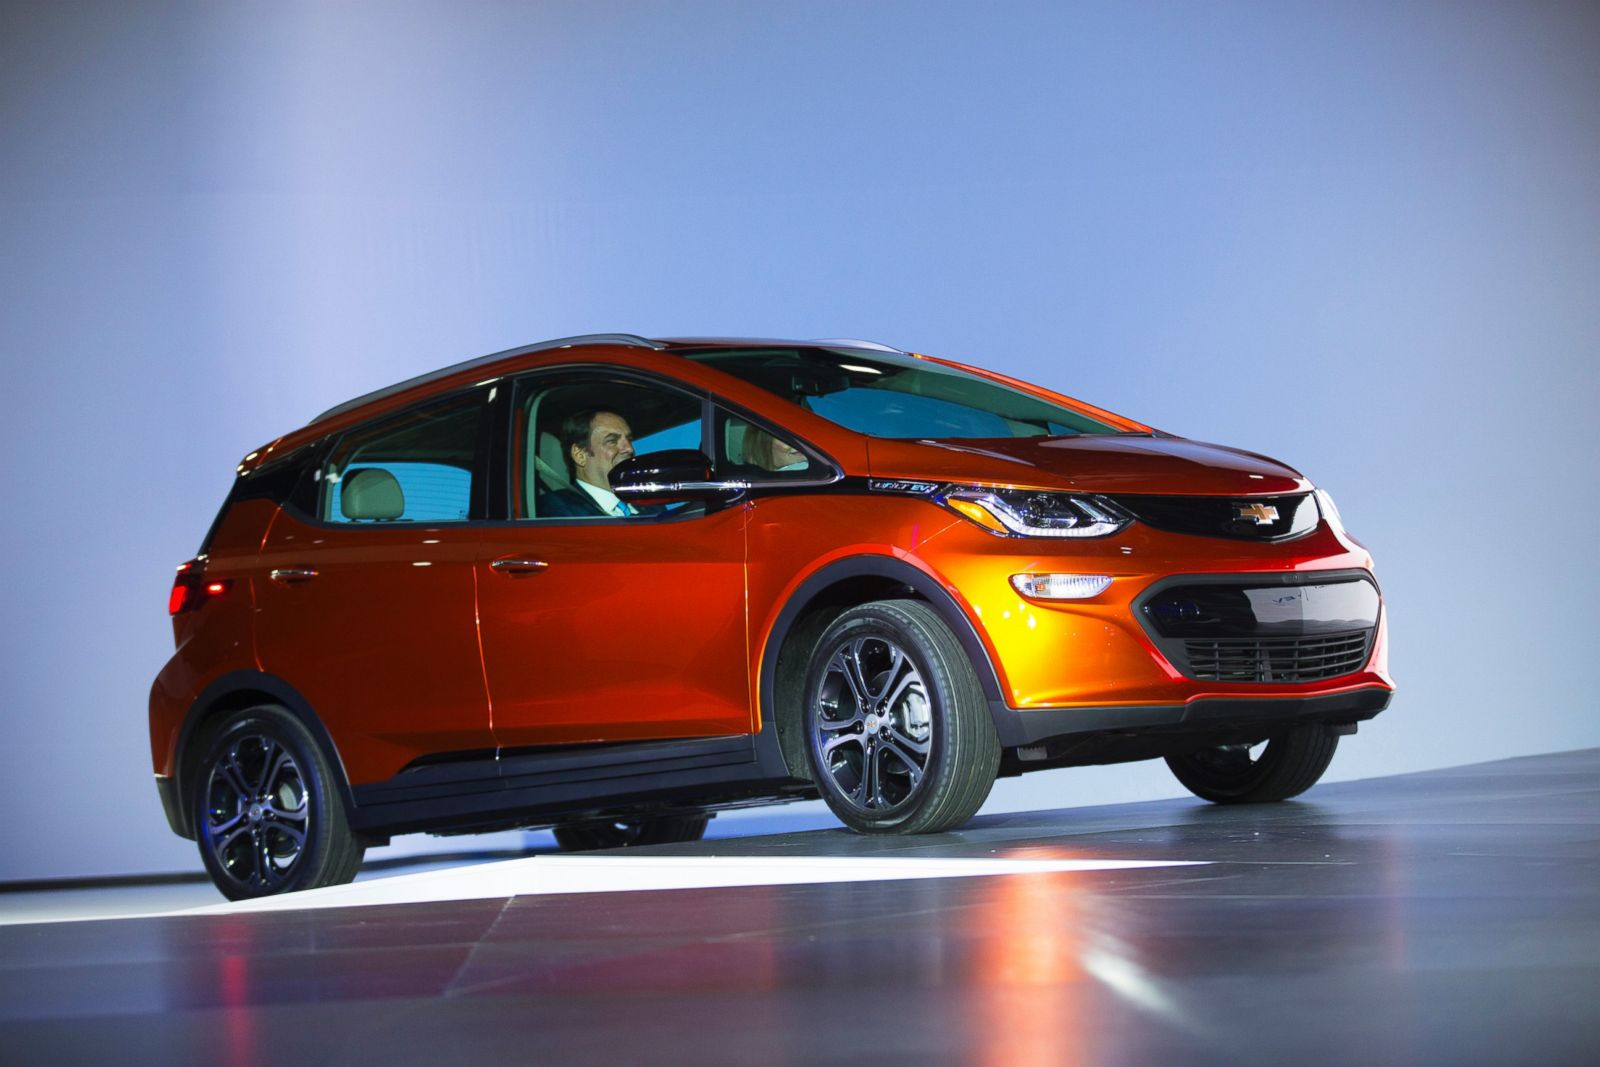 Chevy Bolt Announces The Latest Battery Fix – Sufficient Or Deficient?